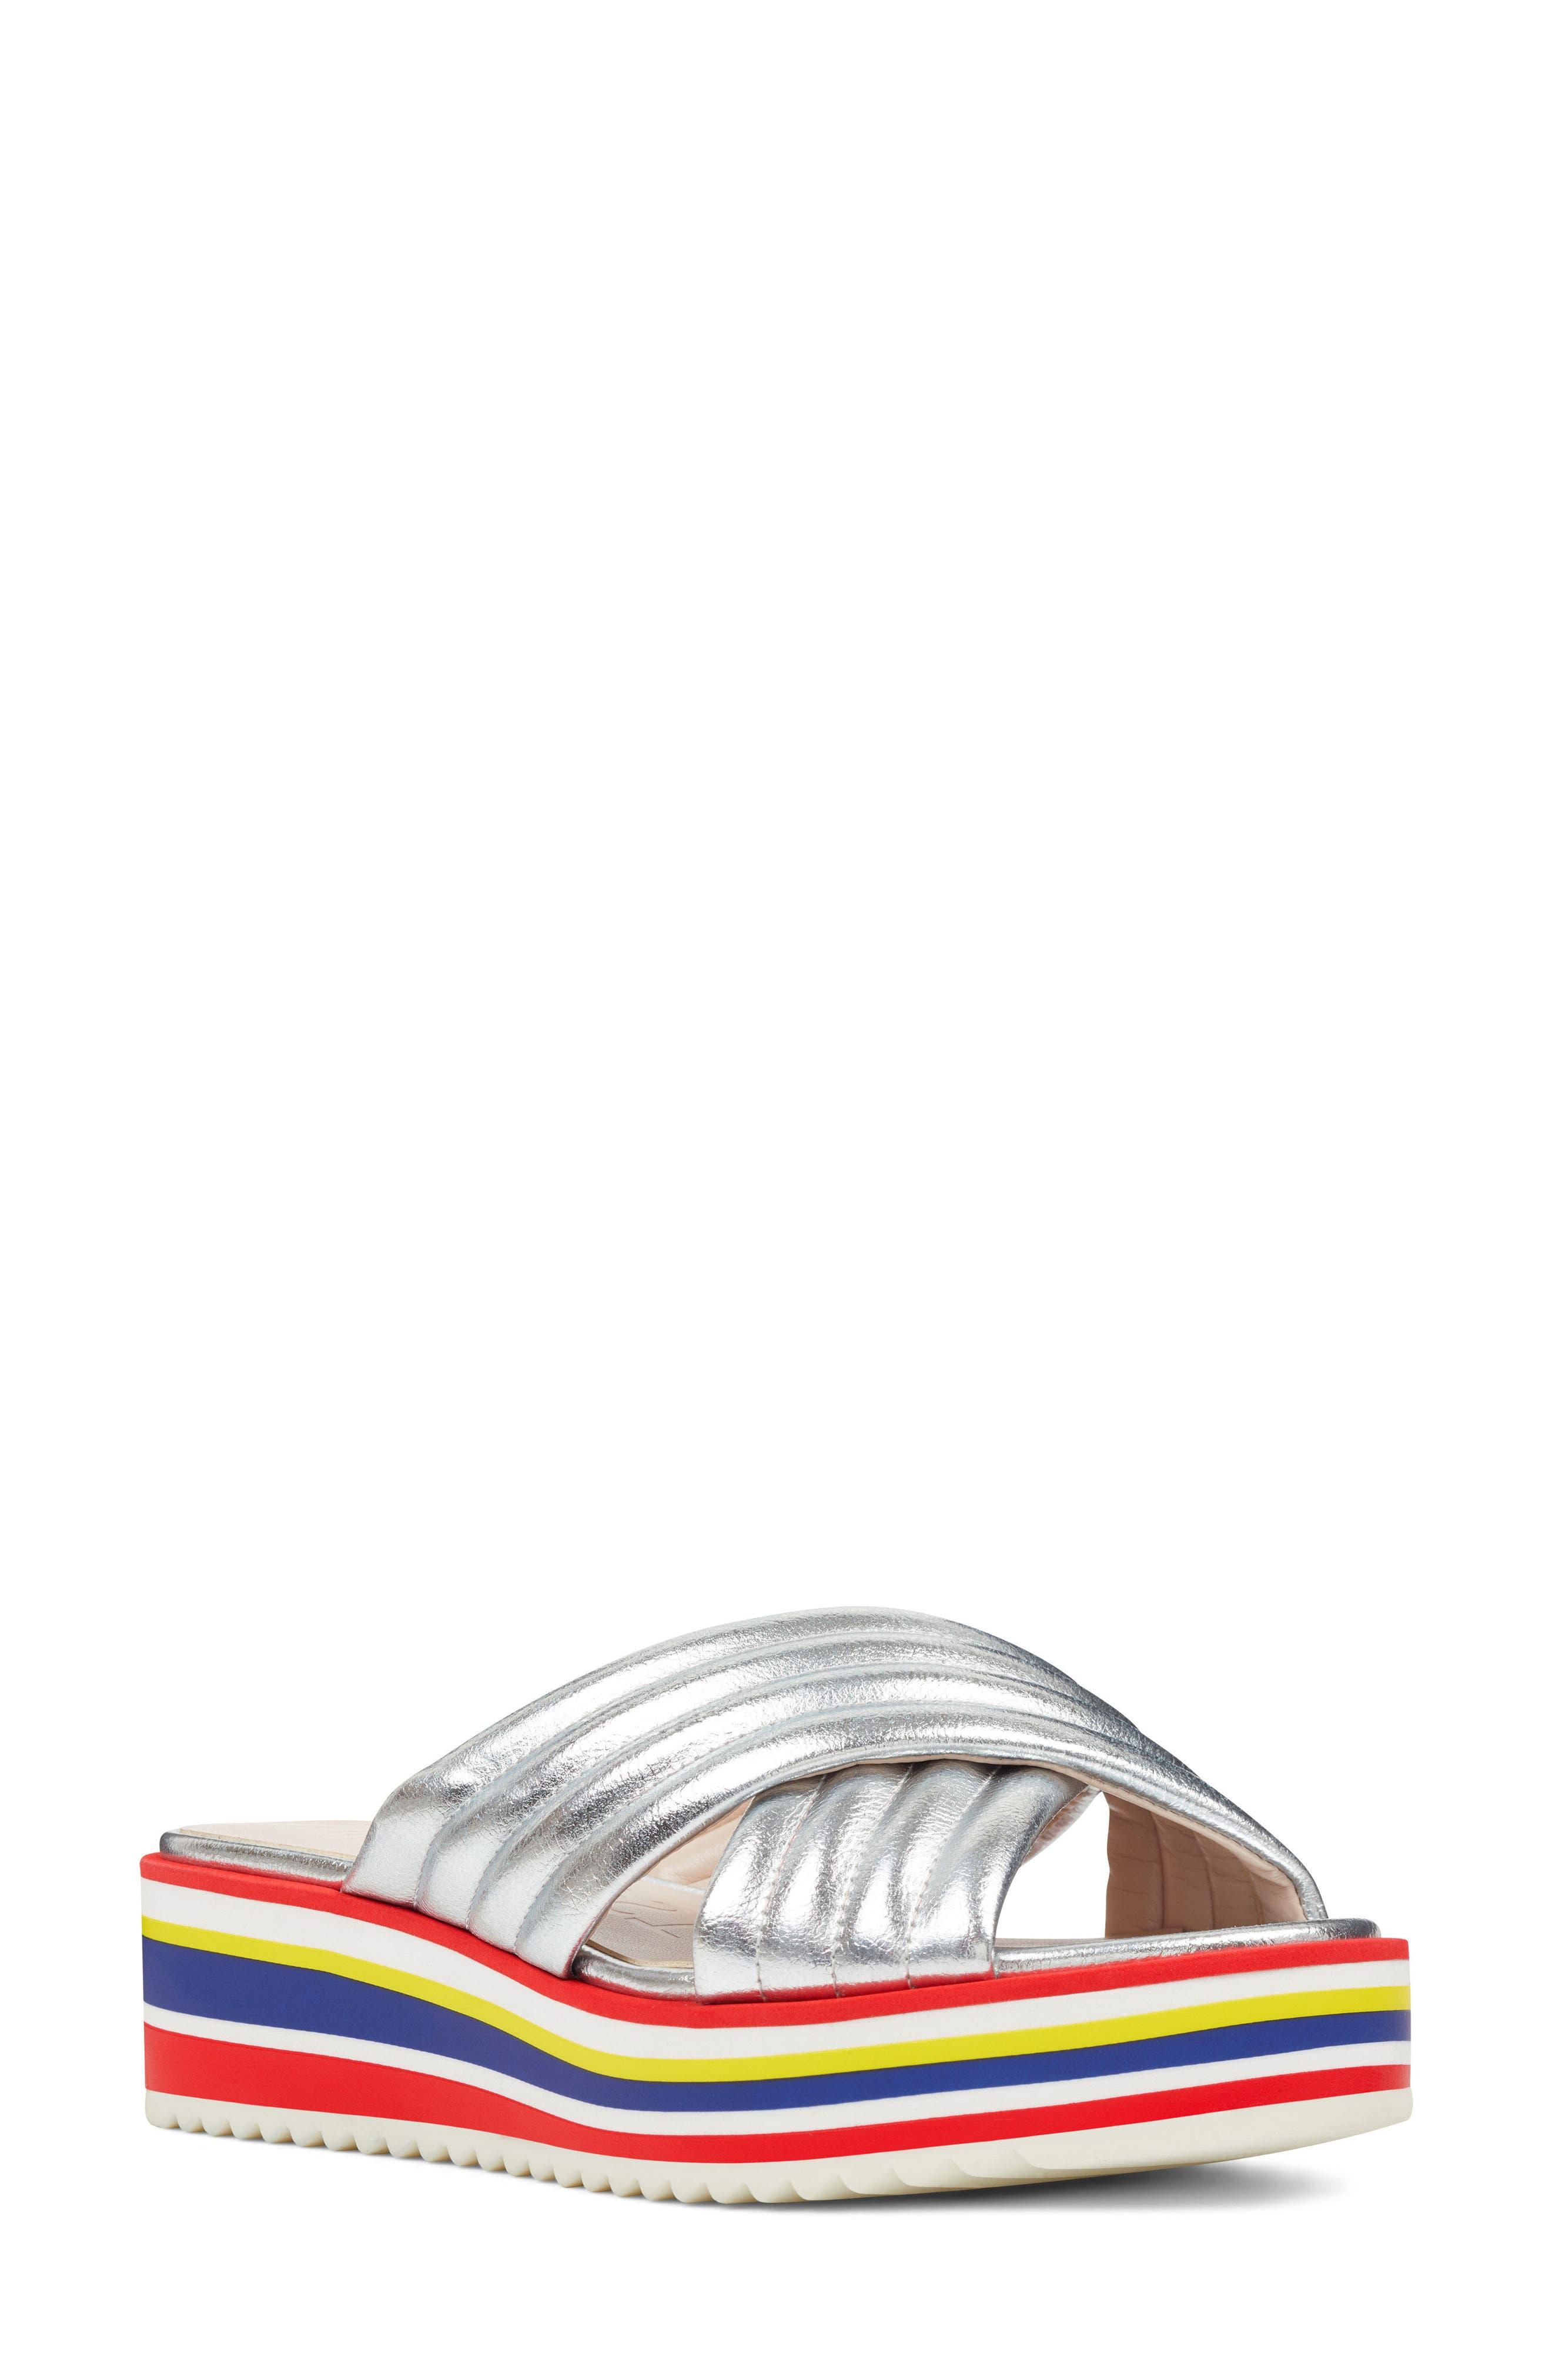 Zonita Platform Slide Sandal,                             Main thumbnail 1, color,                             Silver Faux Leather